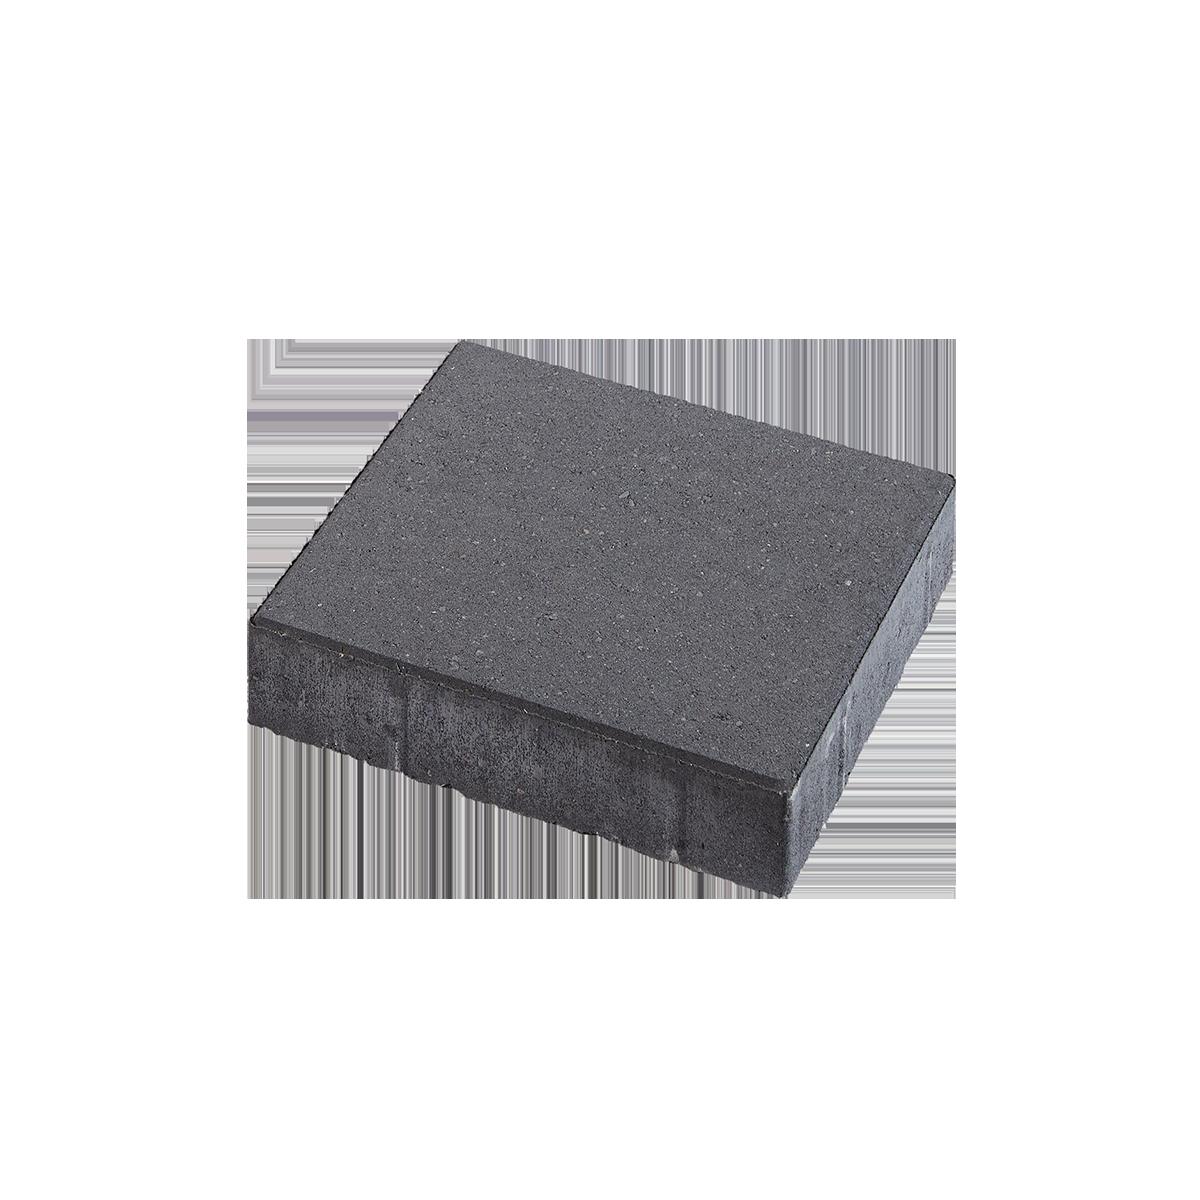 Fliser 30x30x5 cm Sort/Antracit